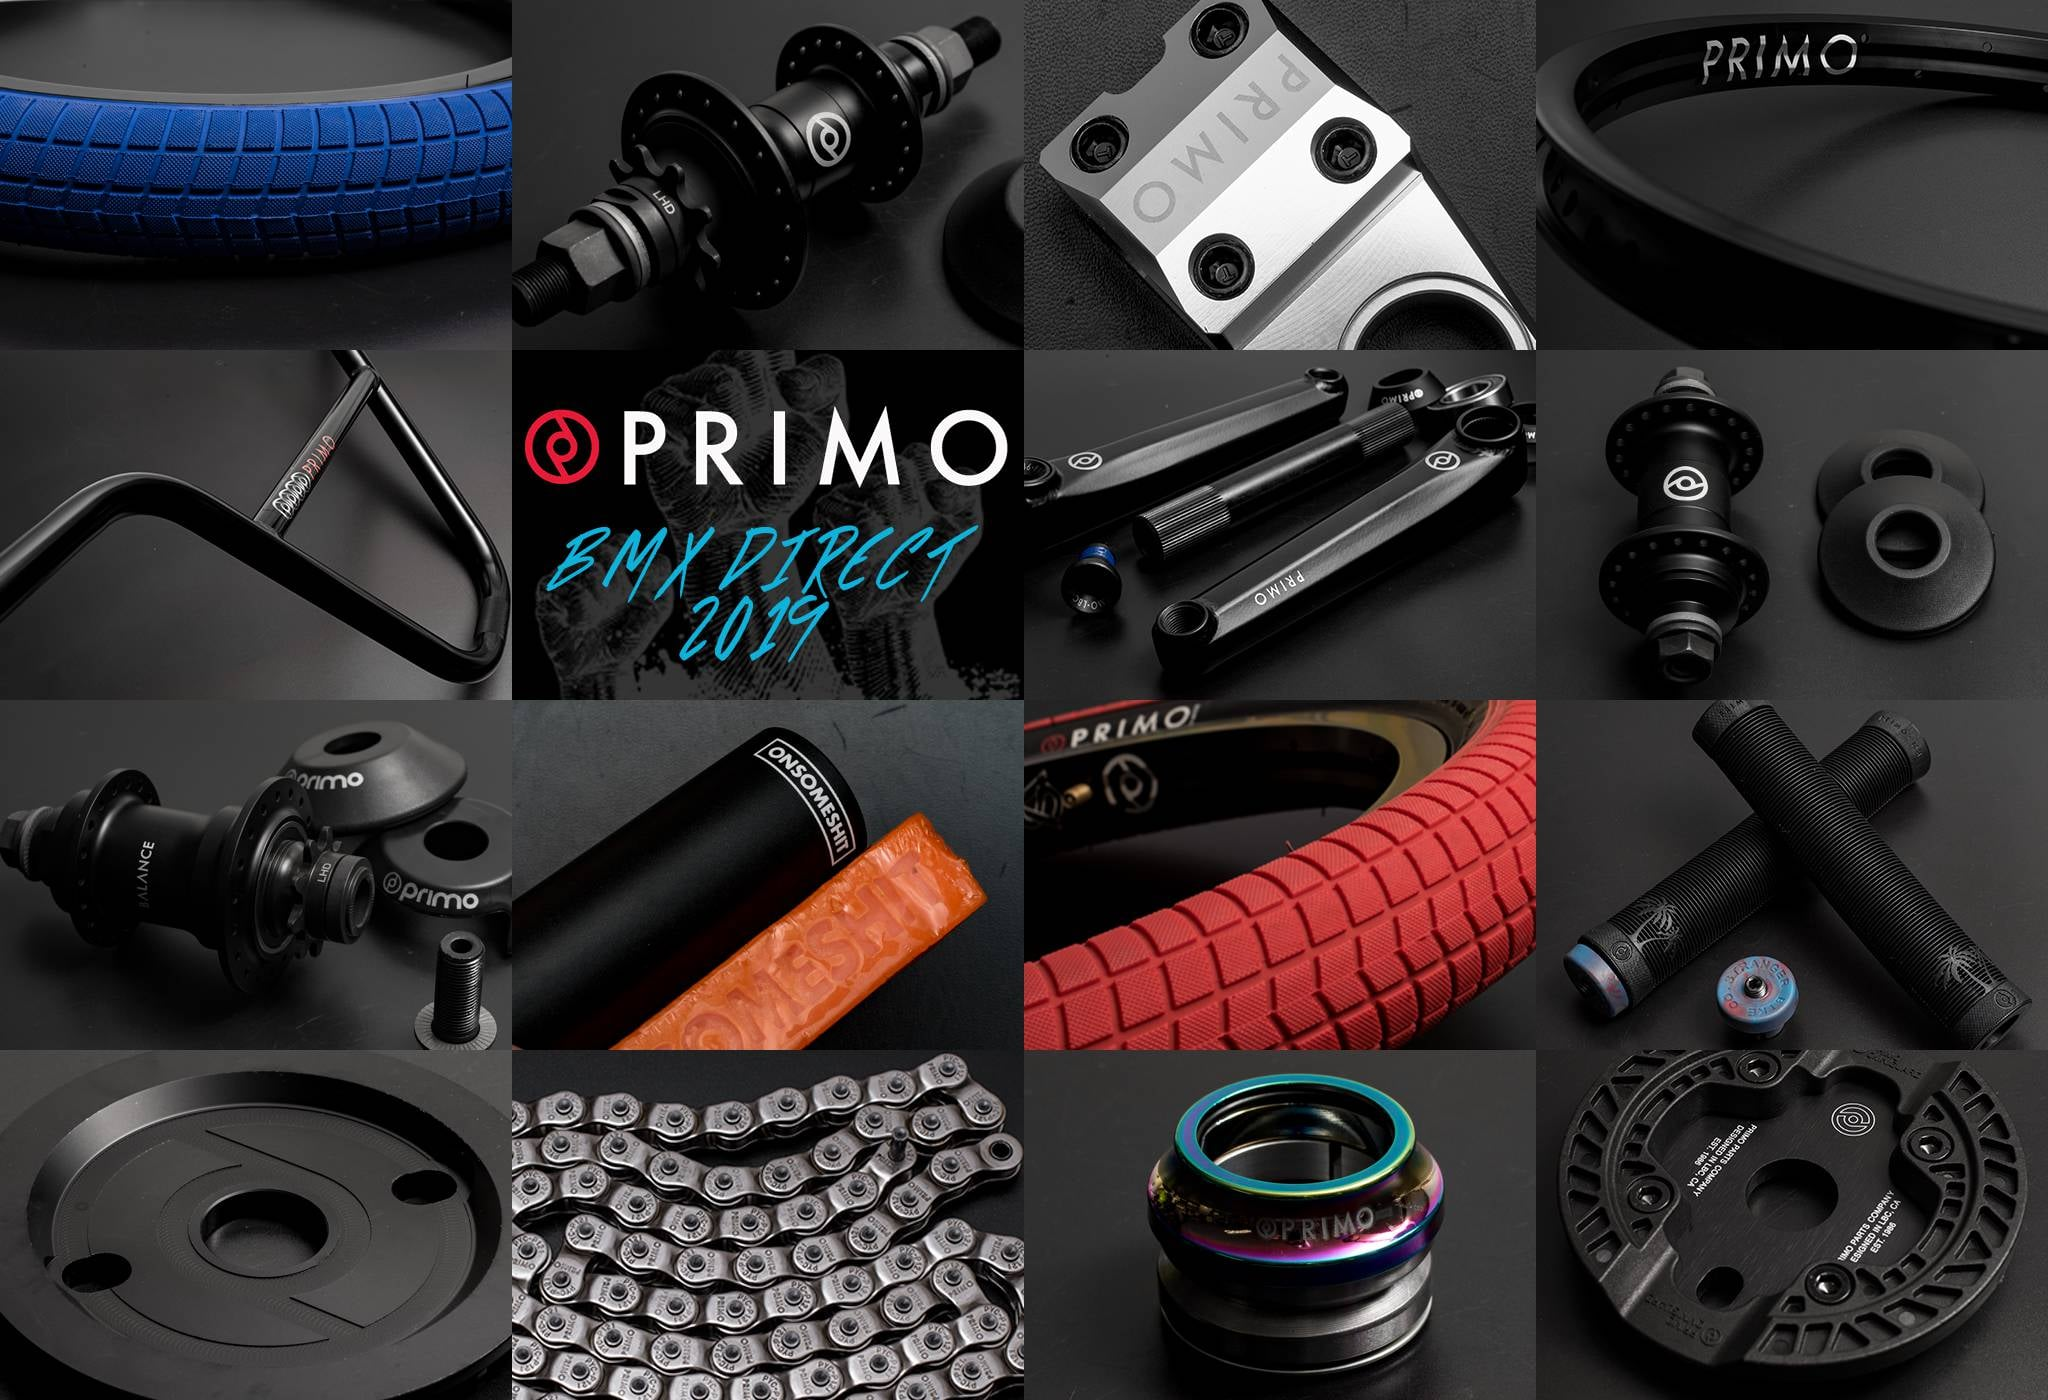 Primo 2019 Shipment